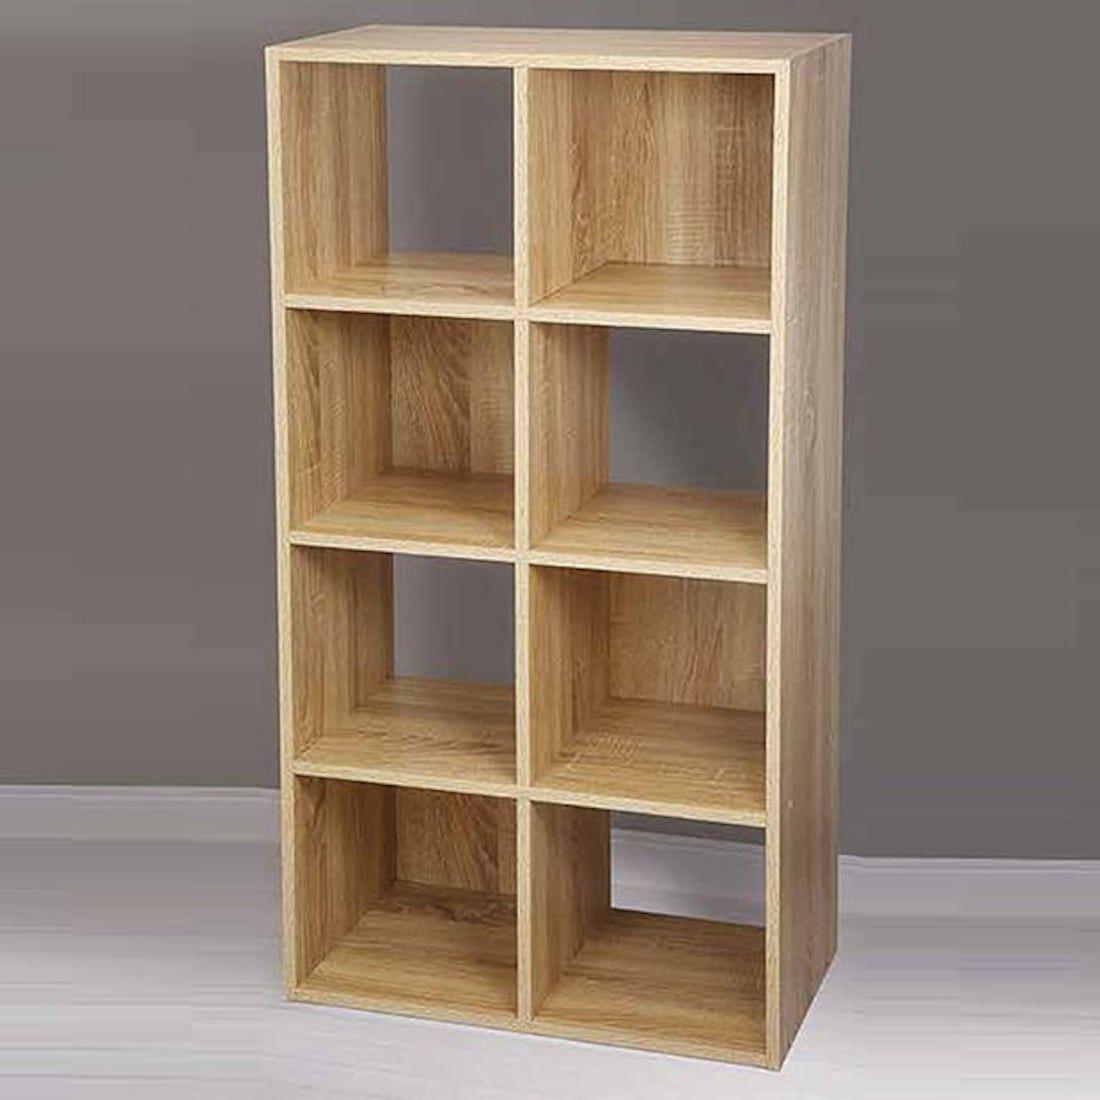 8 Cube Storage Unit Wood Look In 2020 8 Cube Storage Unit Cube